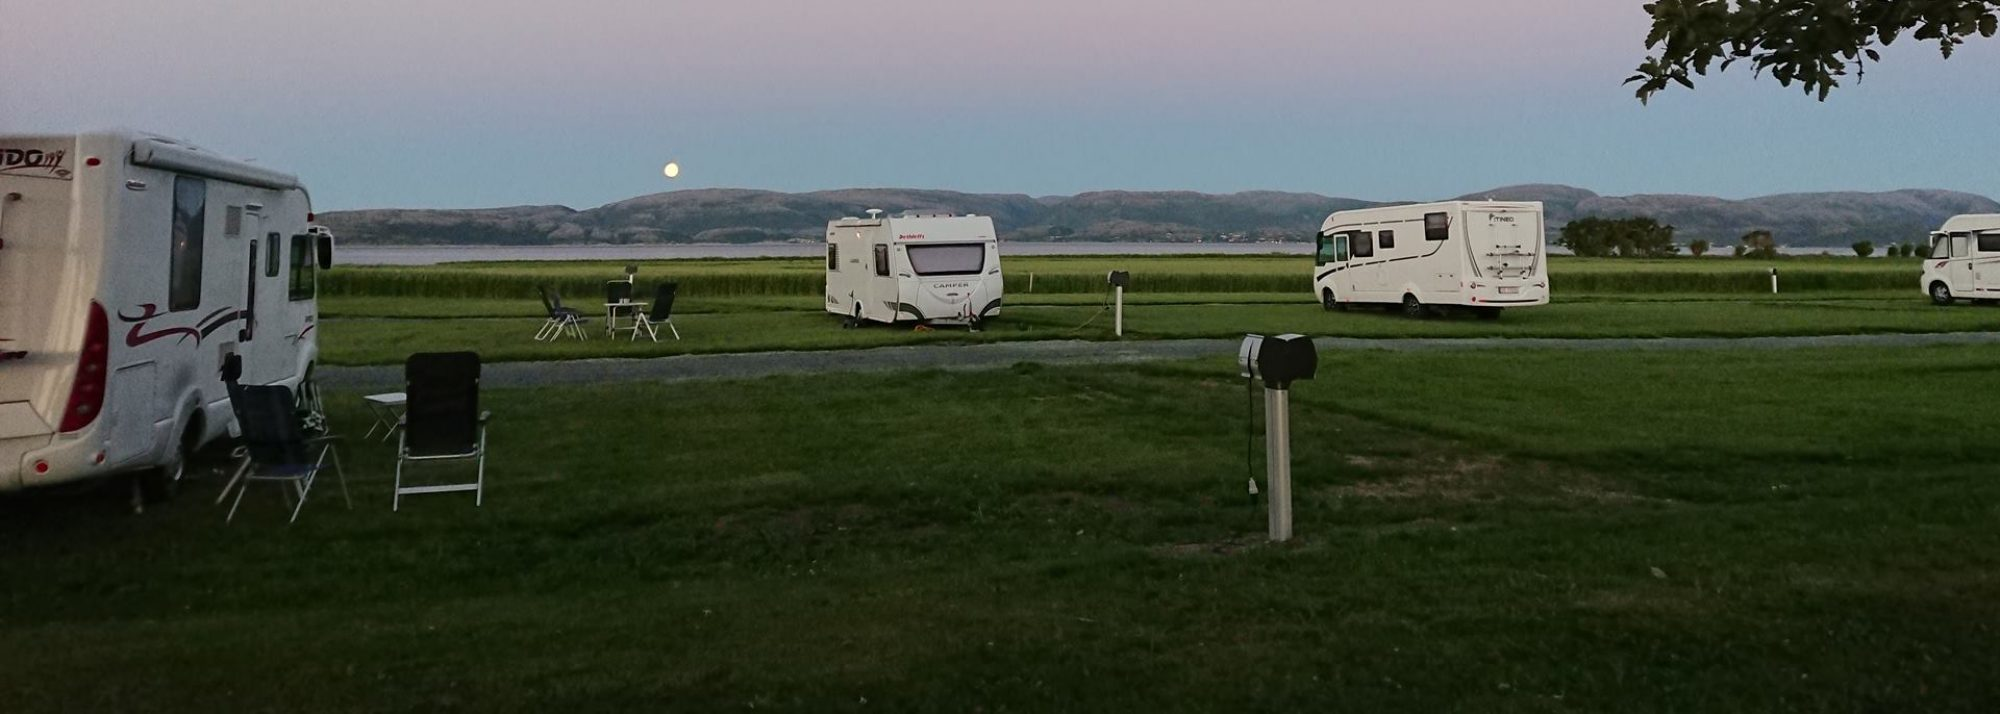 Ørland Camping